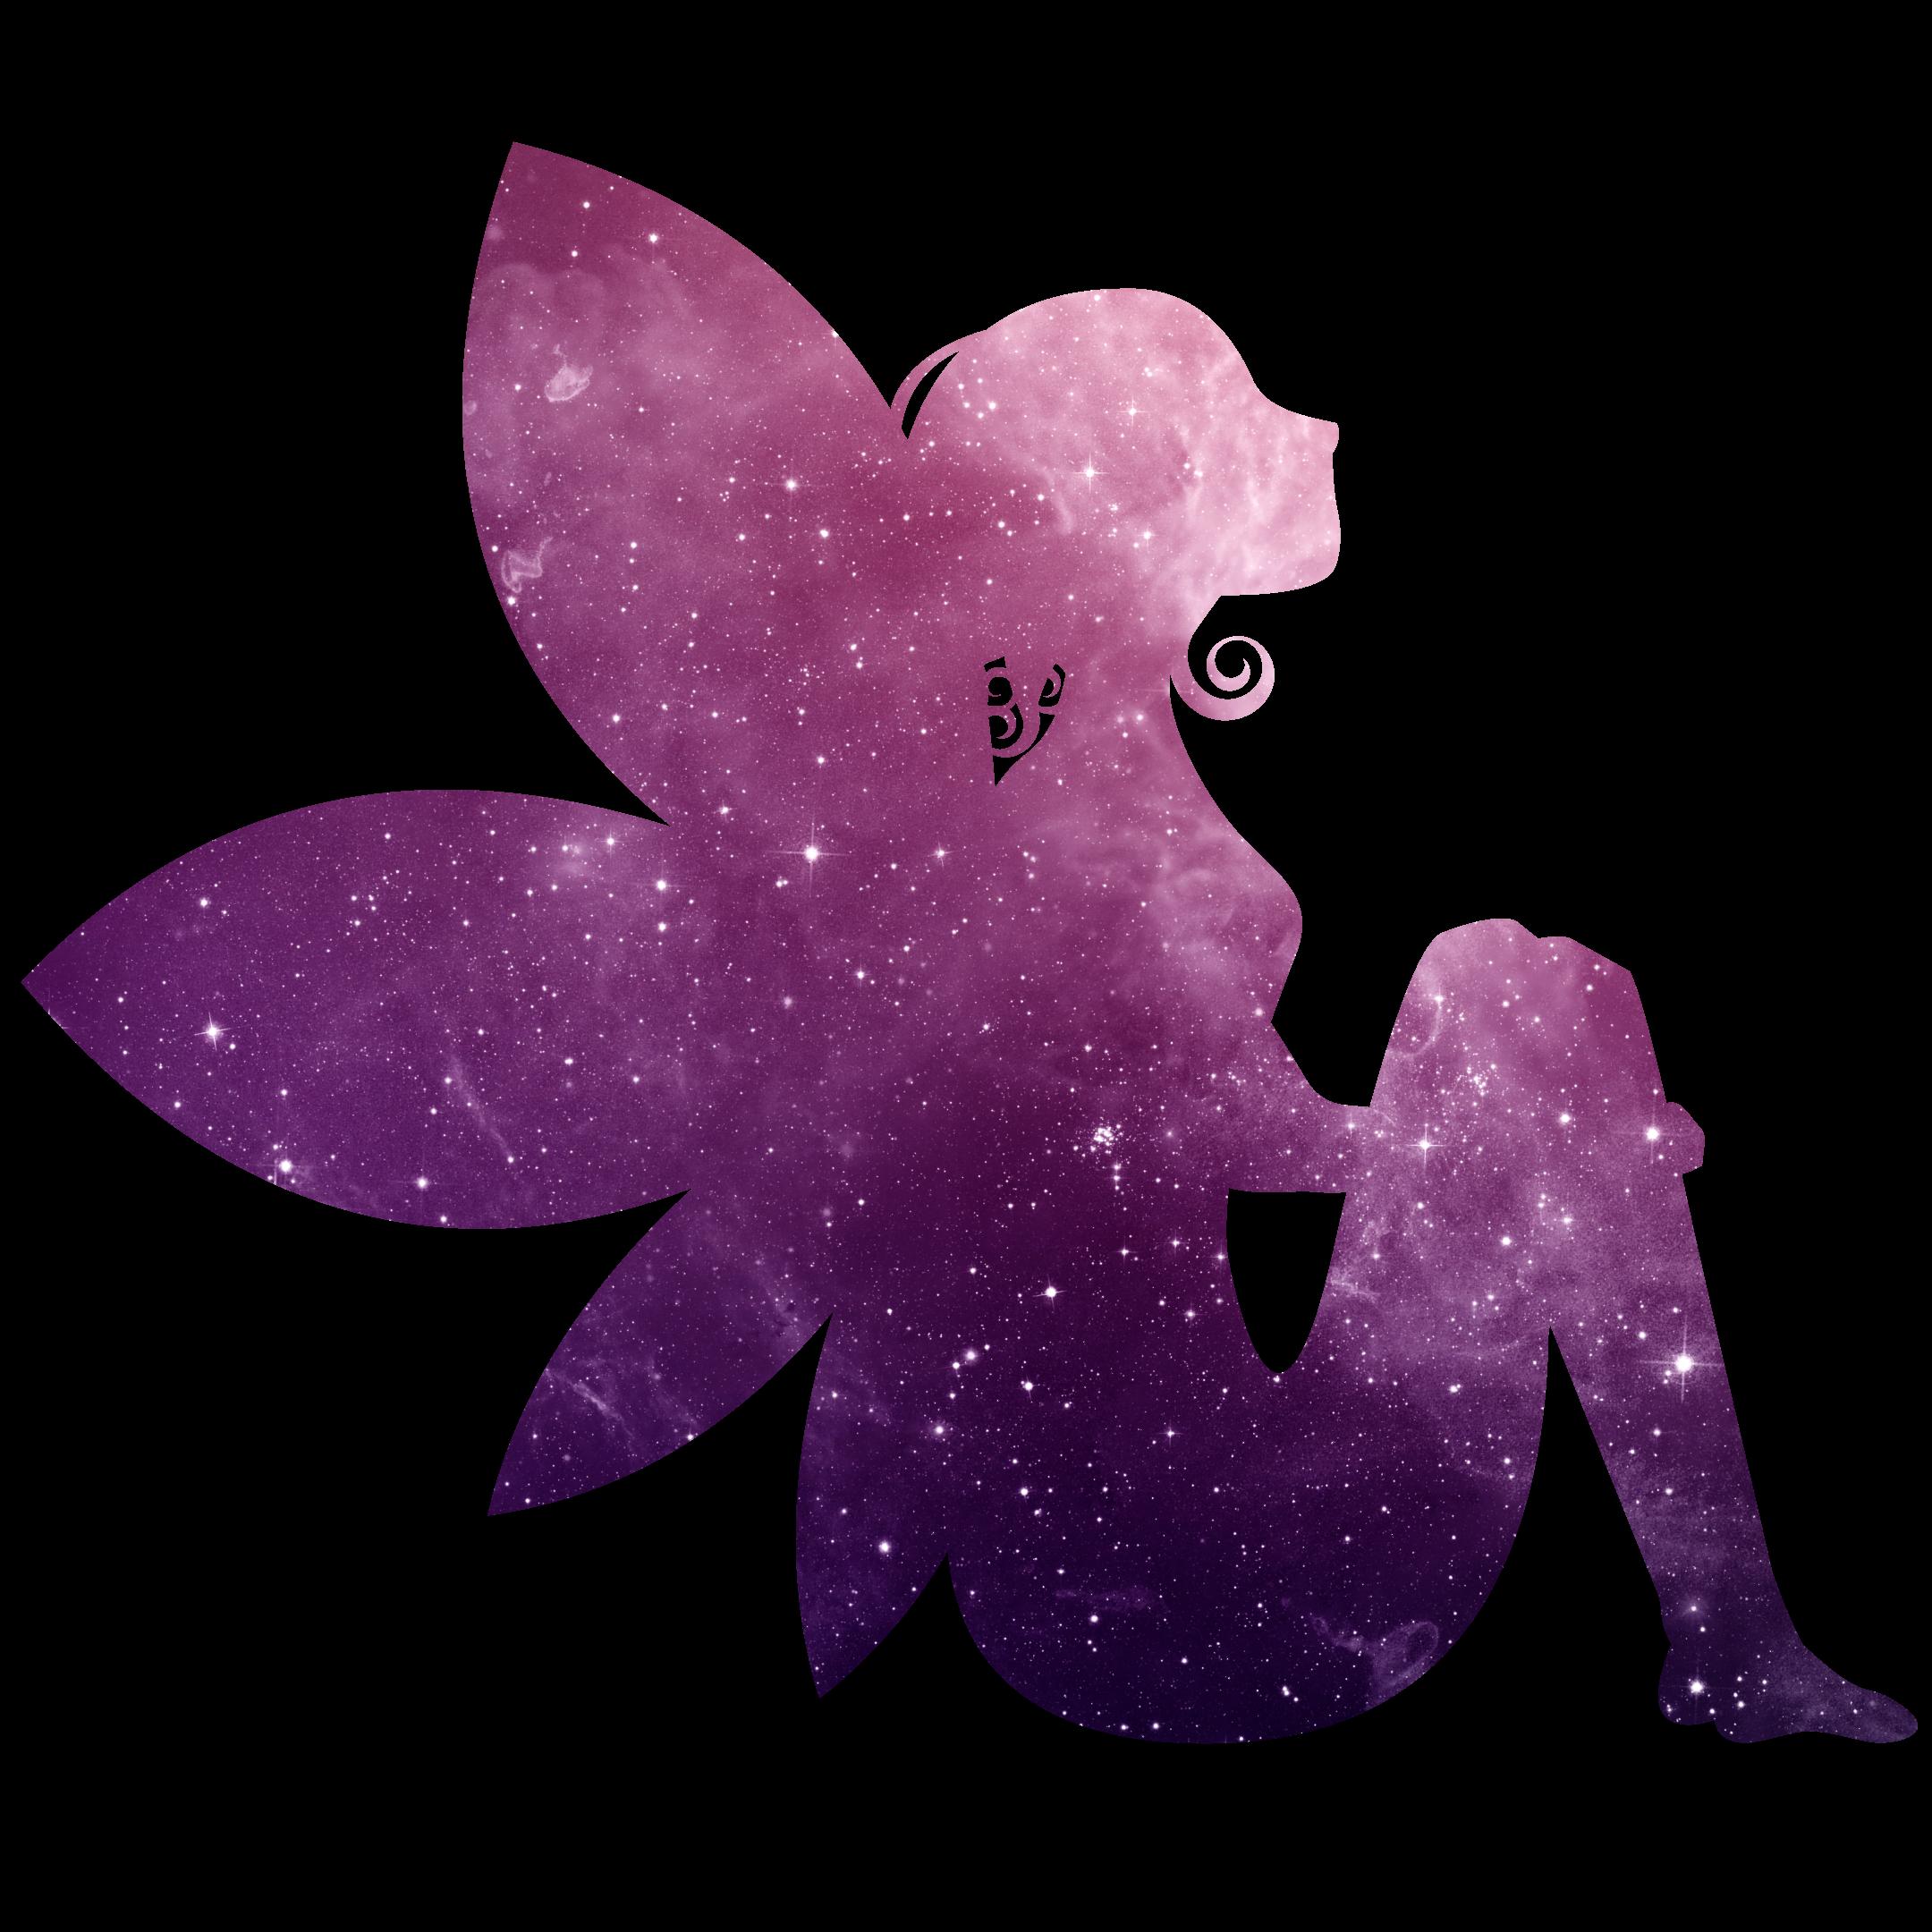 Fee Elfe lila Glitzer Universum Sternenhimmel magisch verzaubert